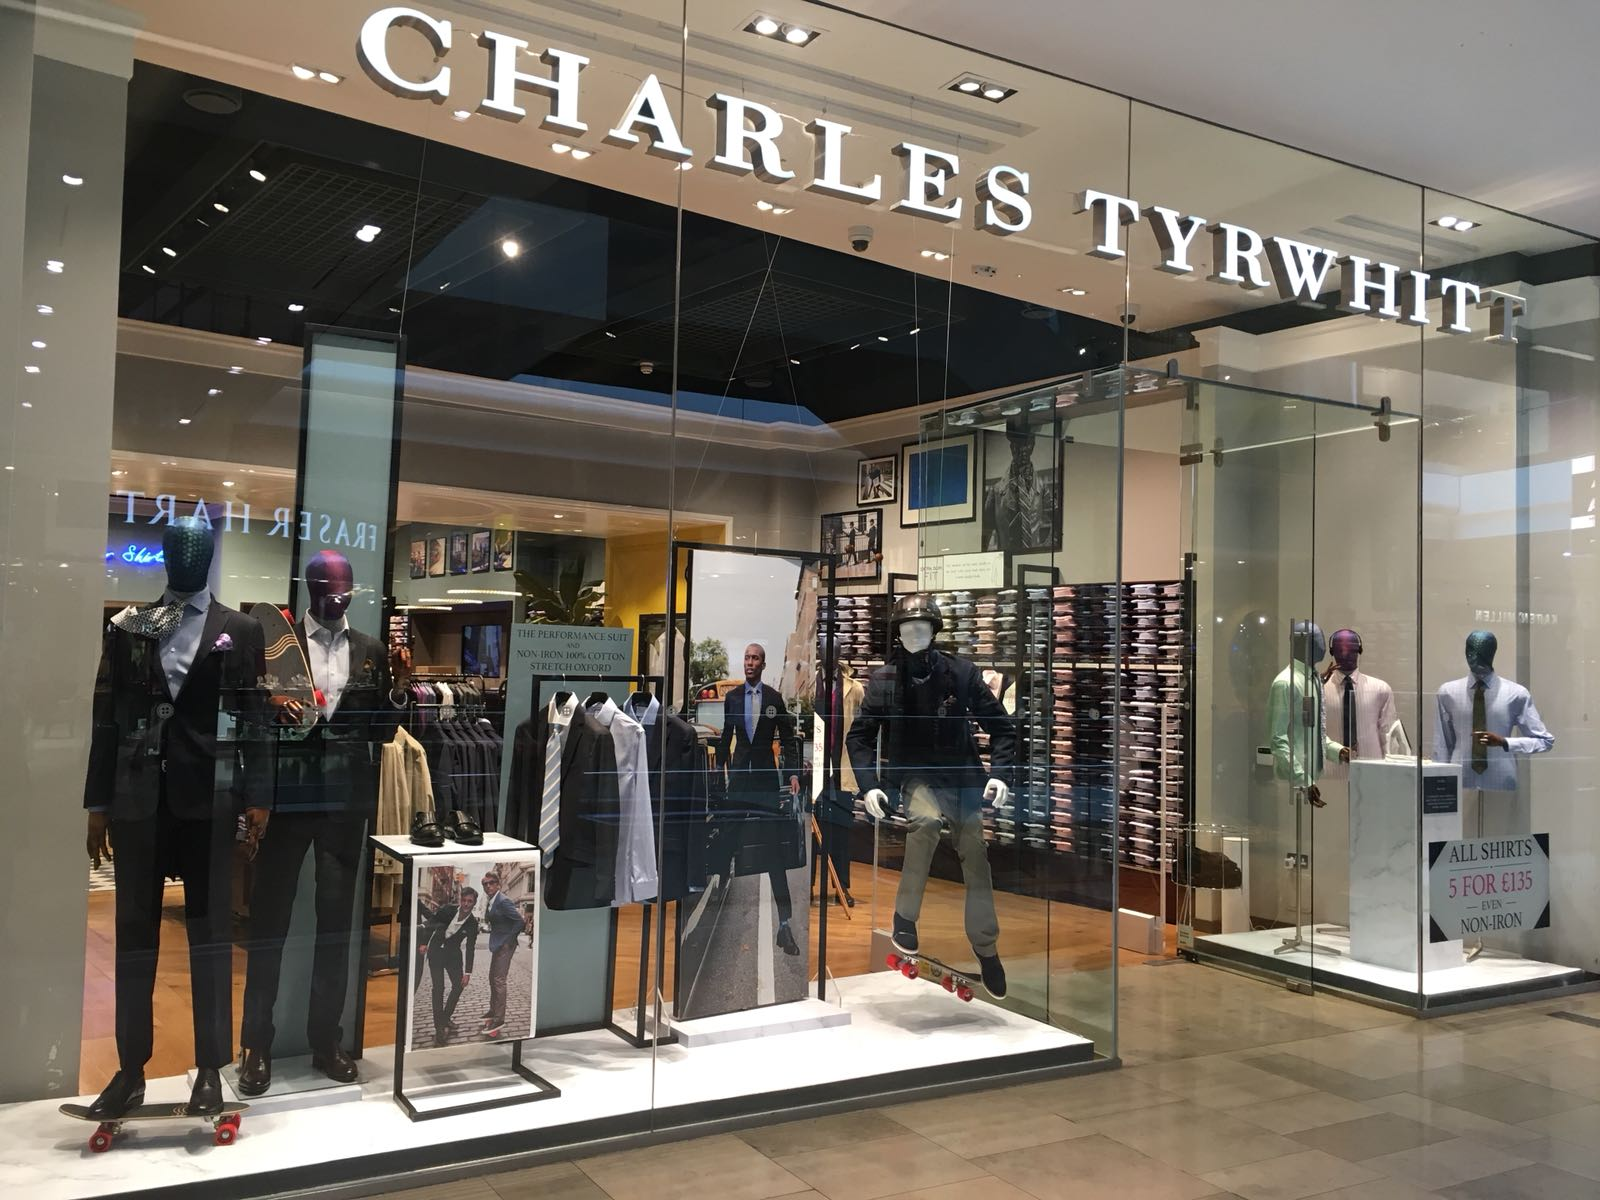 Westfield Stratford Store Charles Tyrwhitt